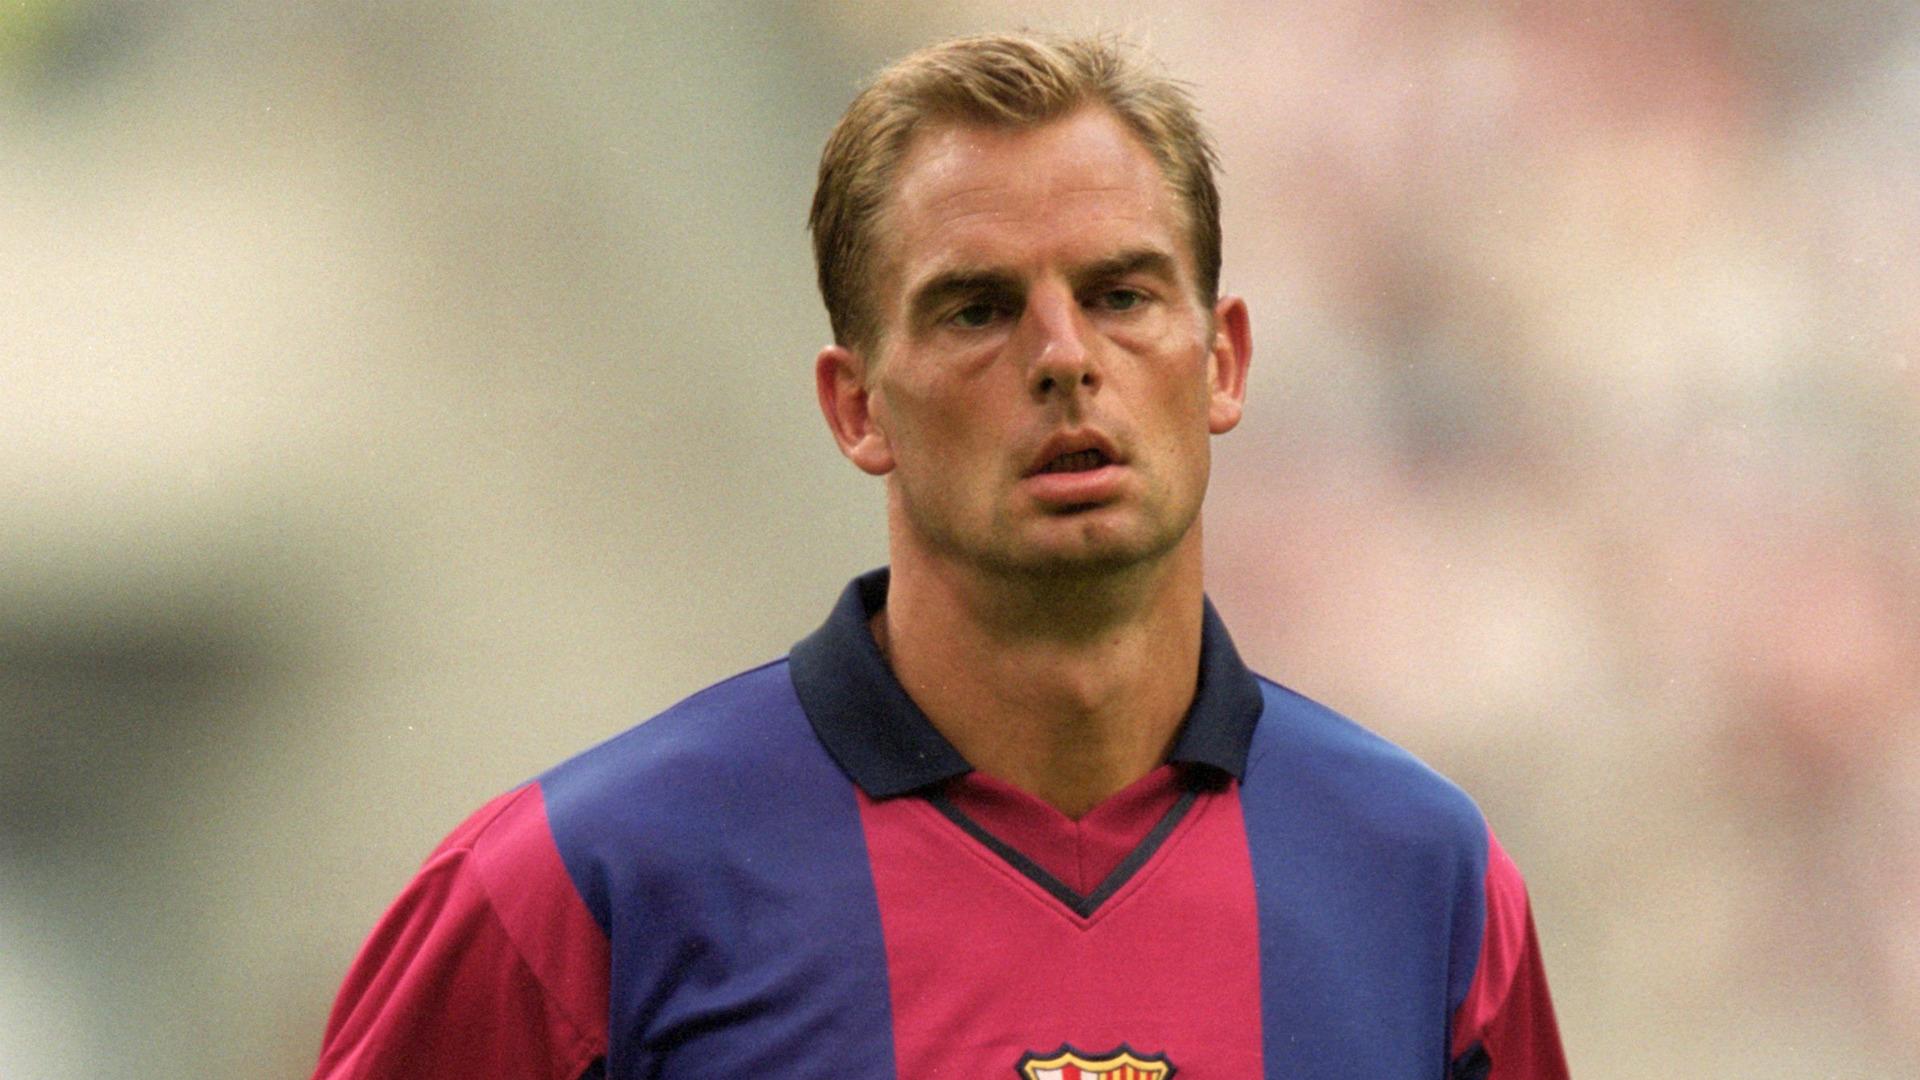 Ronald de Boer ex Barcelona player